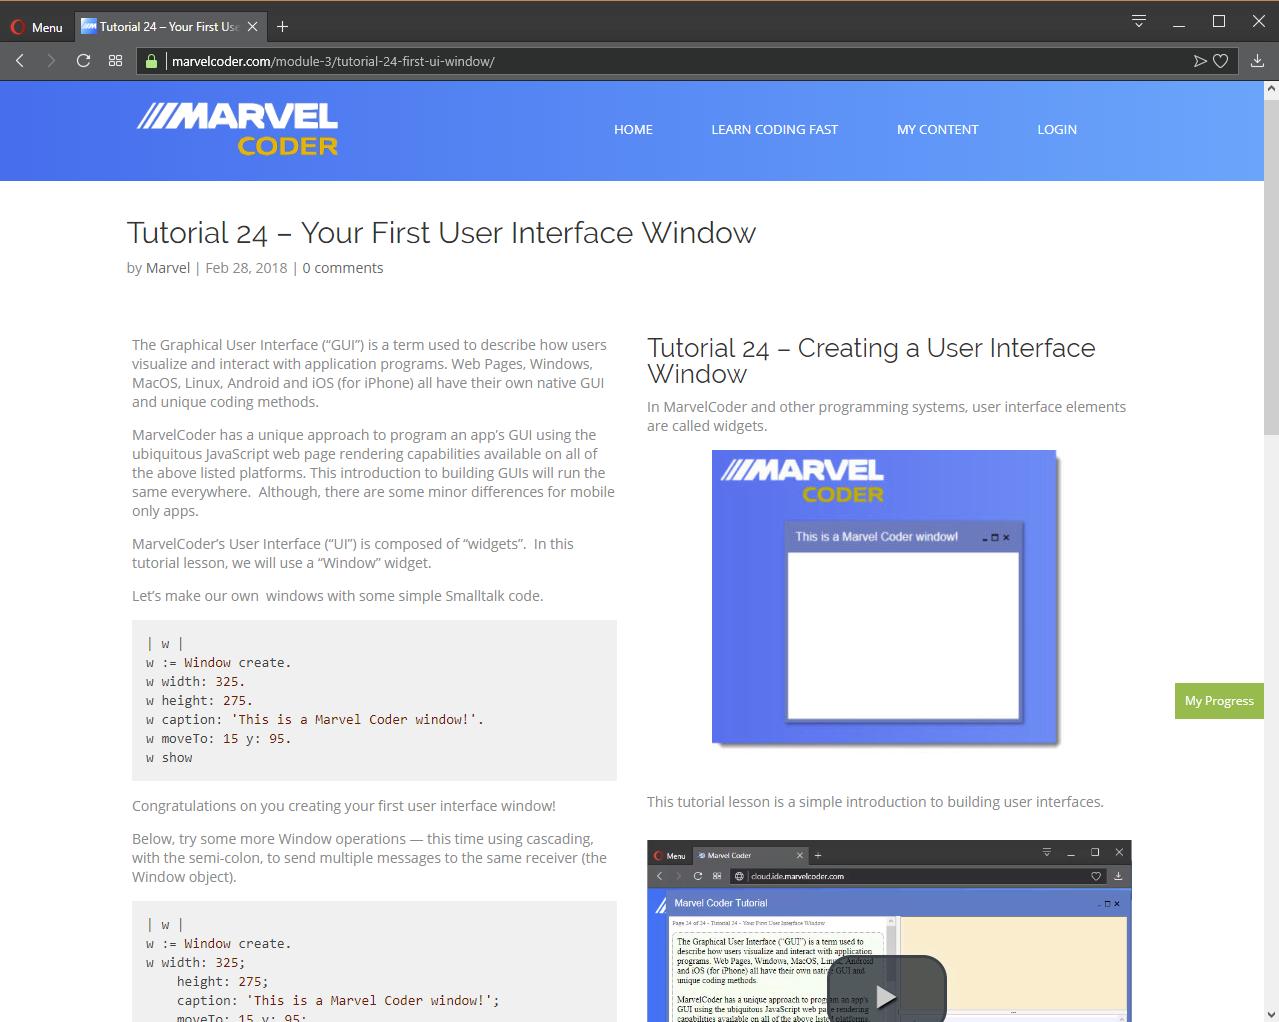 Development Software, MarvelCoder — Learn Coding Fast Screenshot